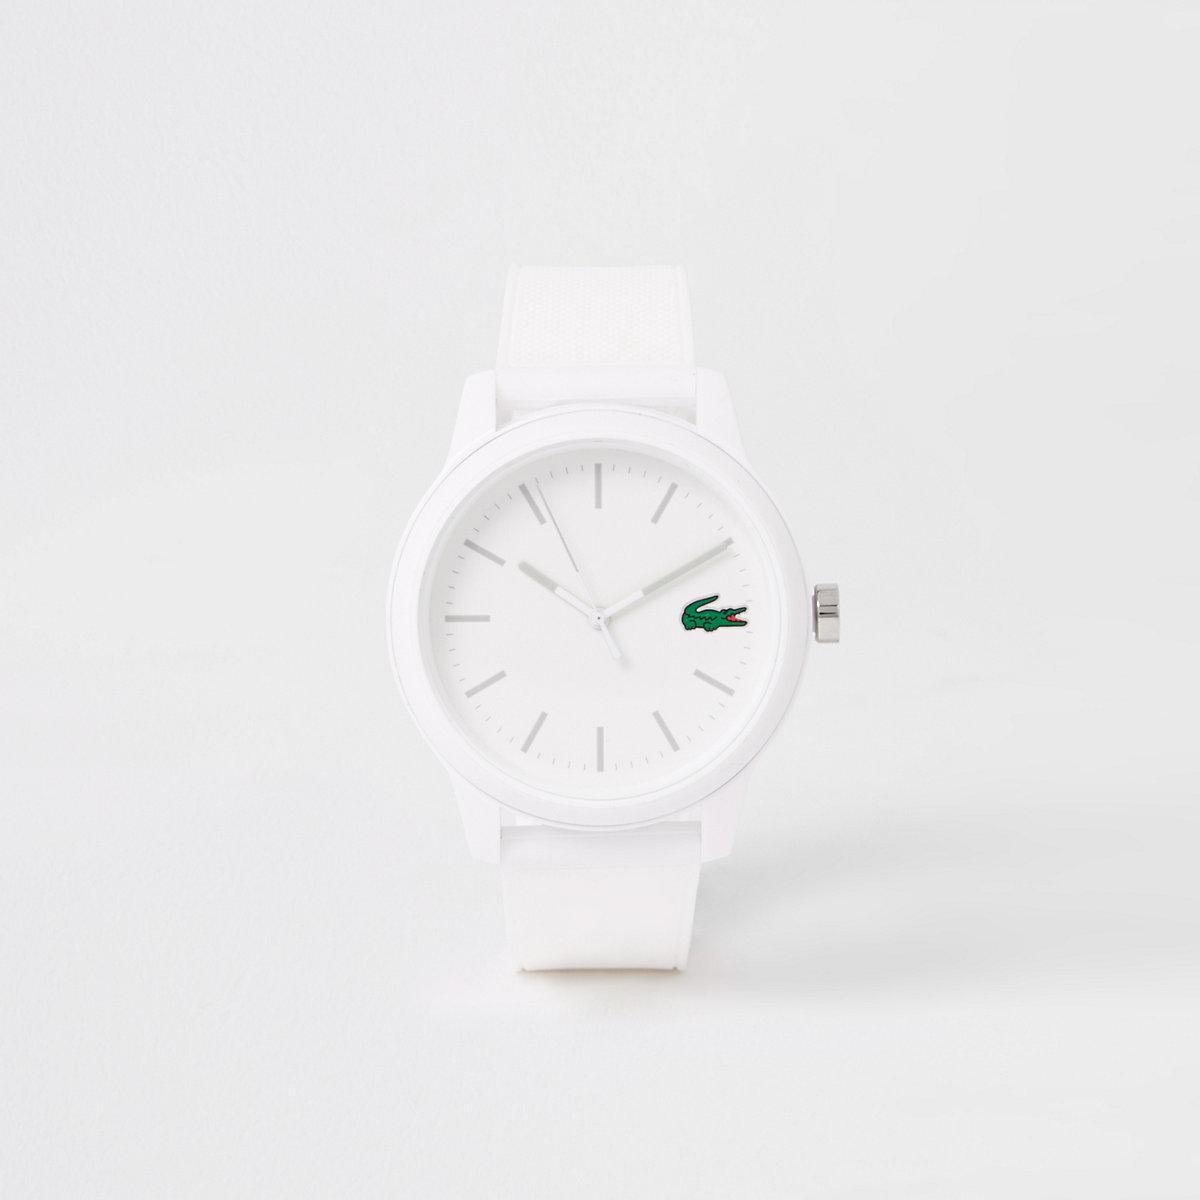 Lacoste white 12.12 silicone strap watch